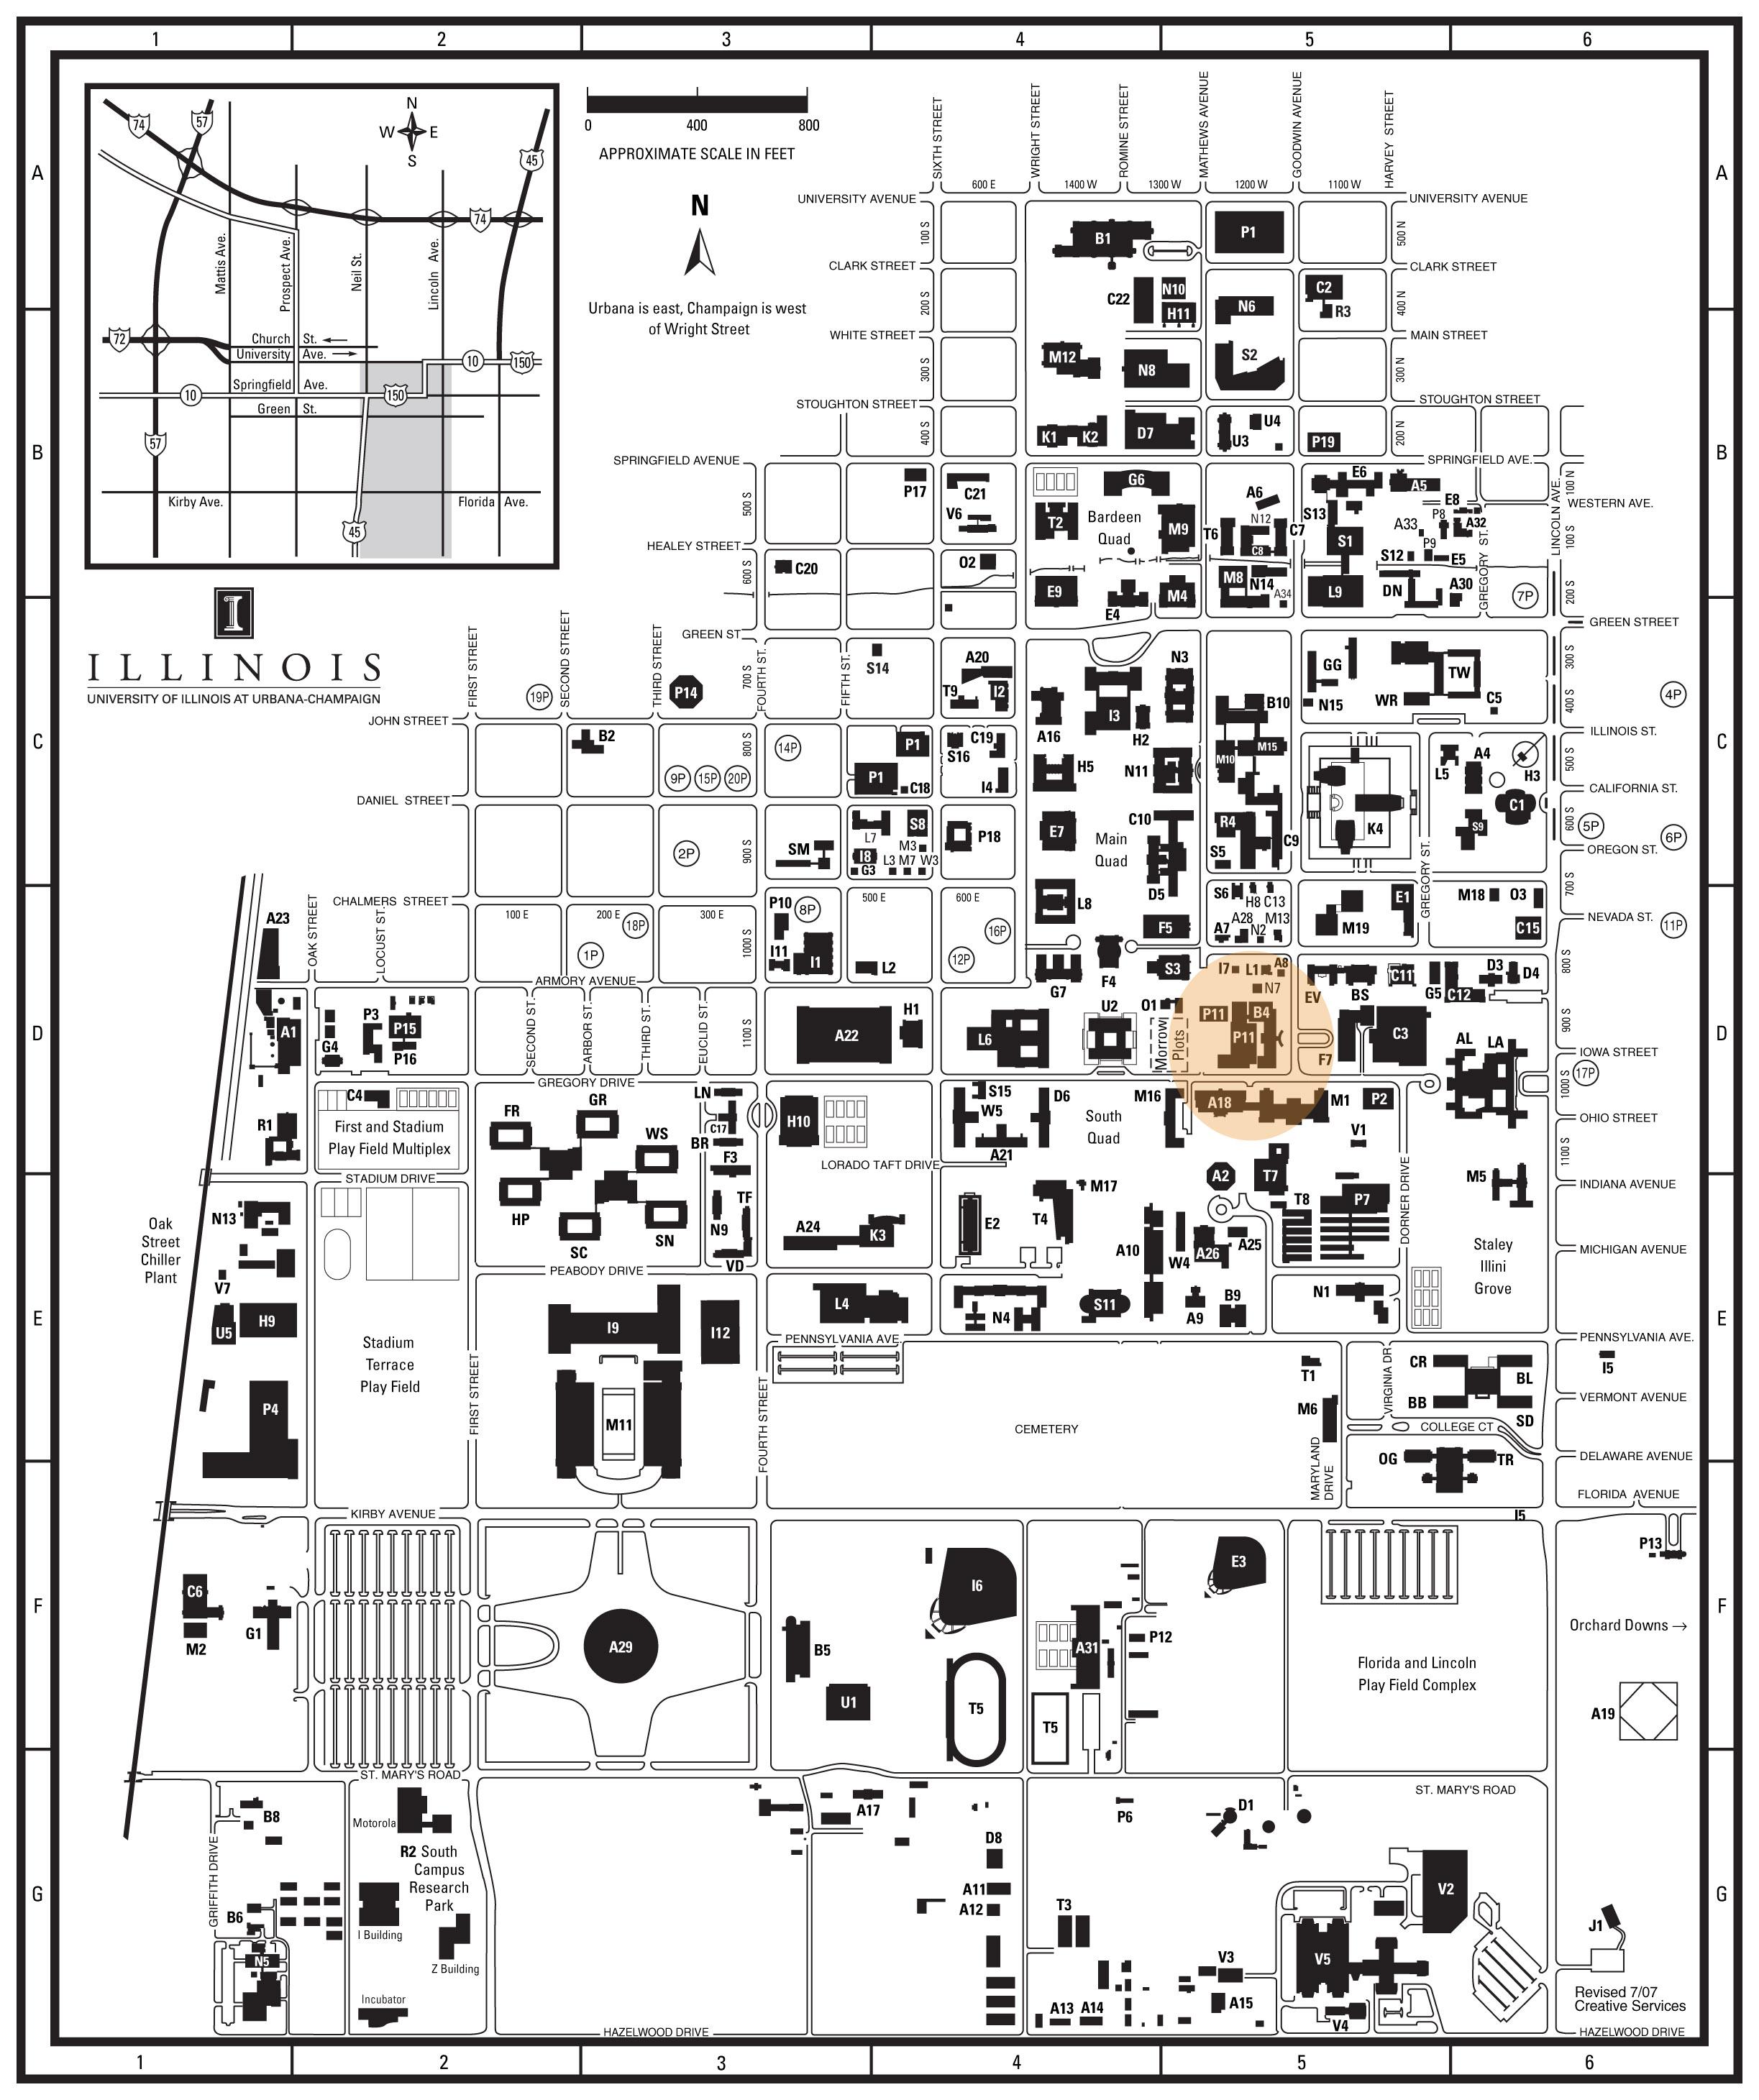 map of university of illinois campus Navigating Chambana Illinois Admissions Blog map of university of illinois campus